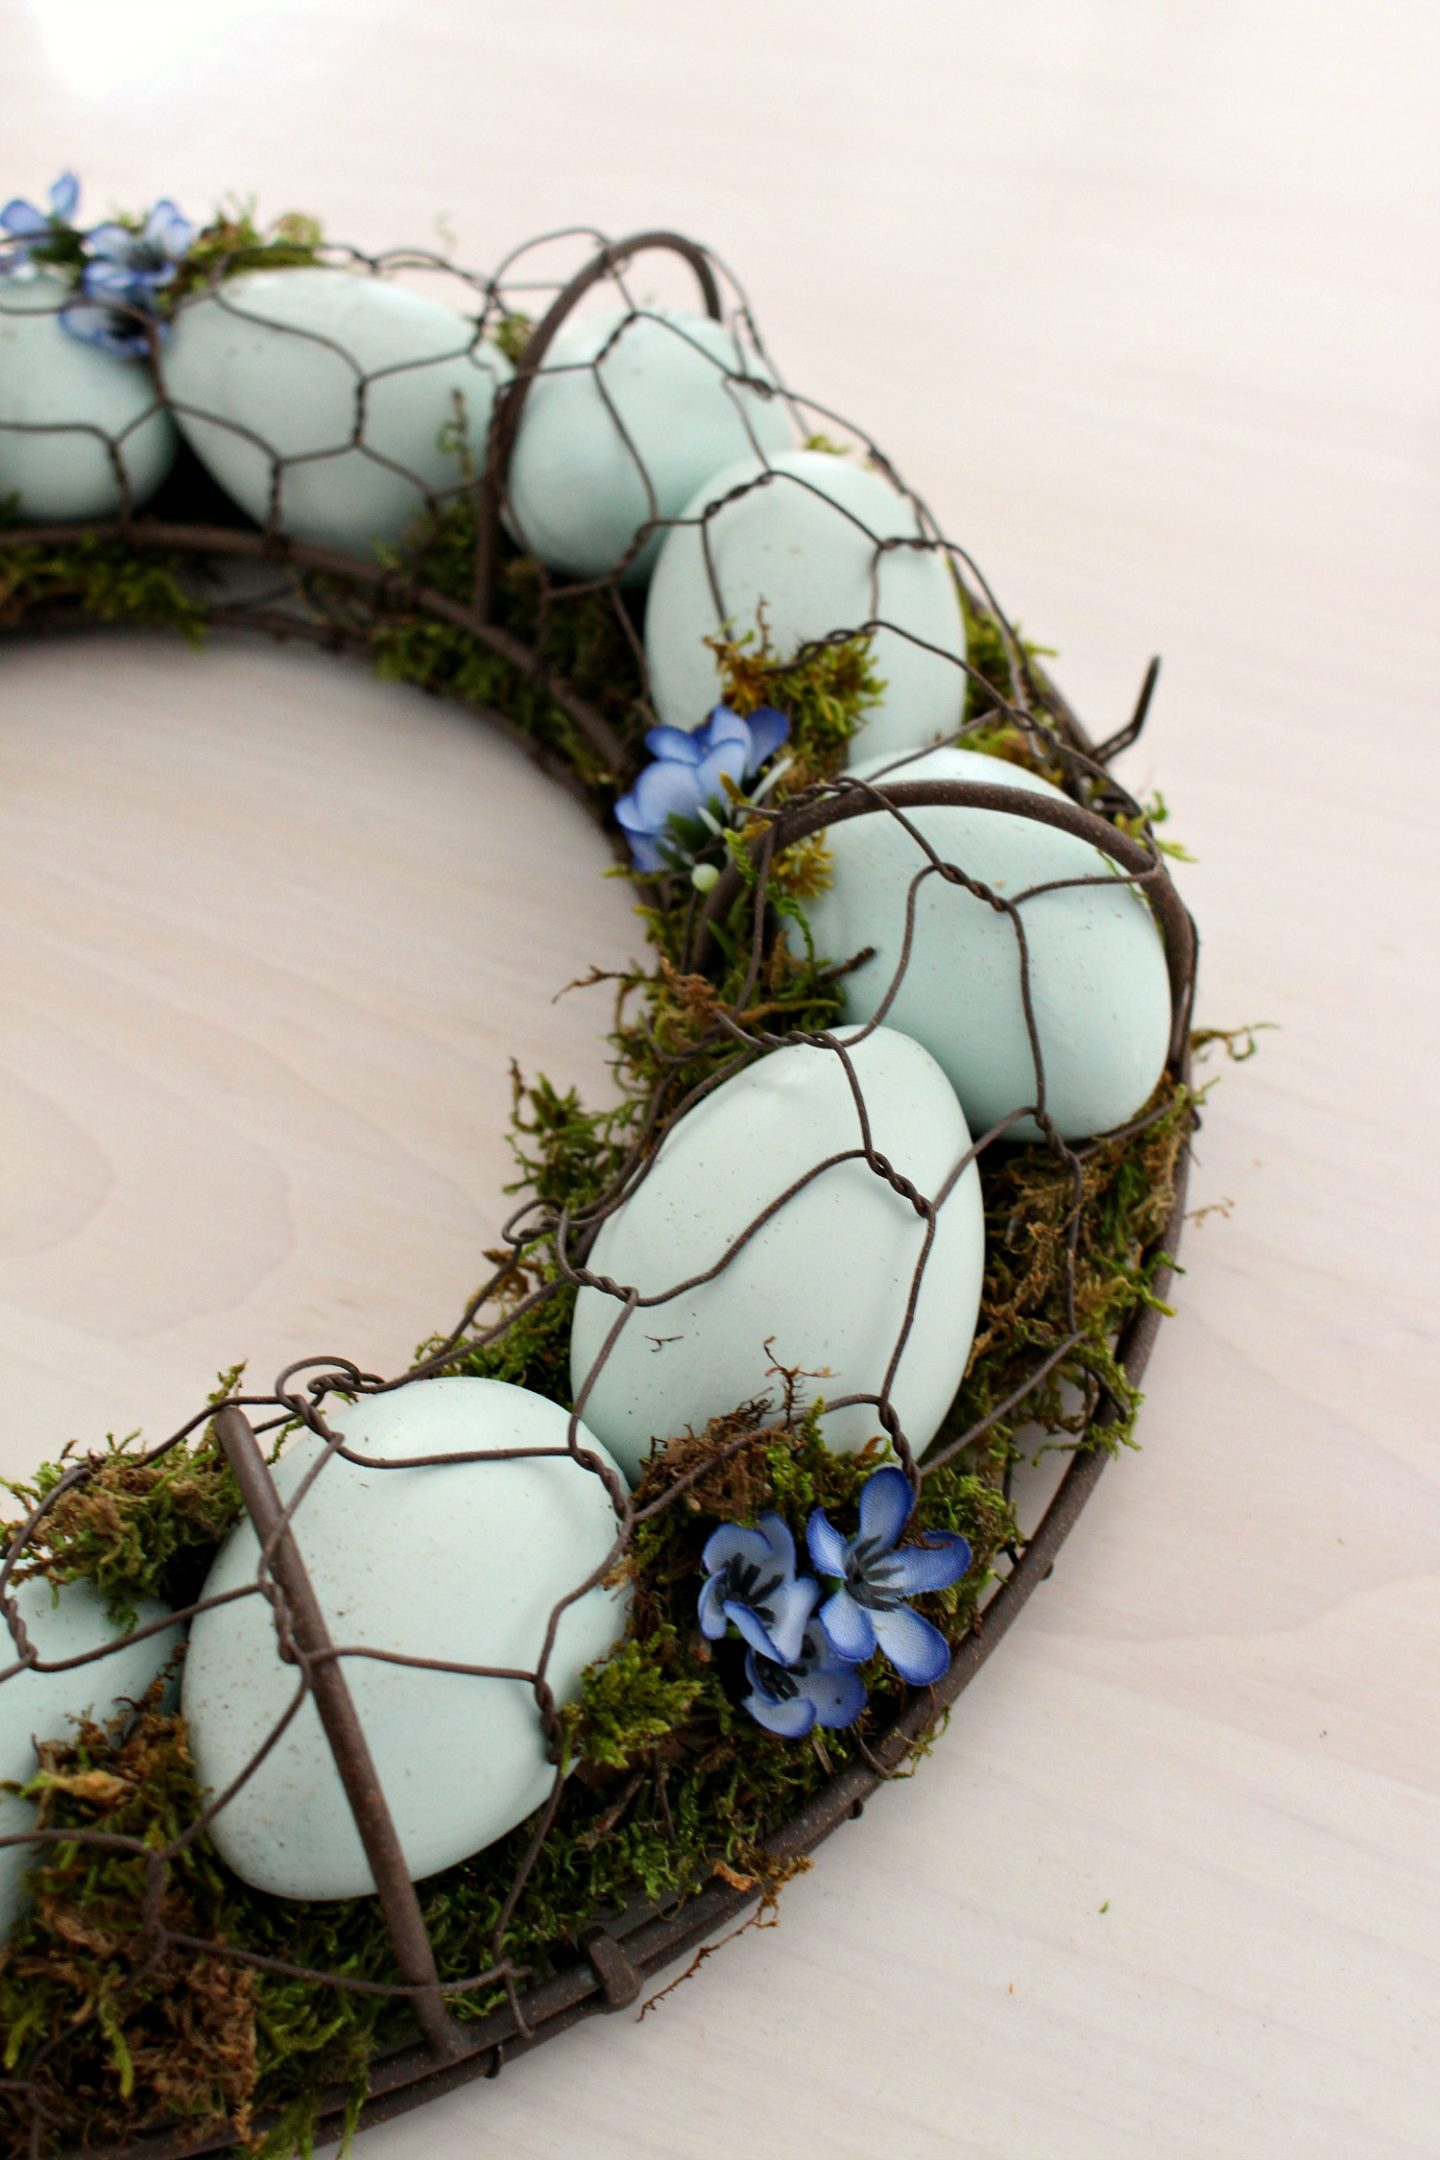 Handmade Egg Wreath